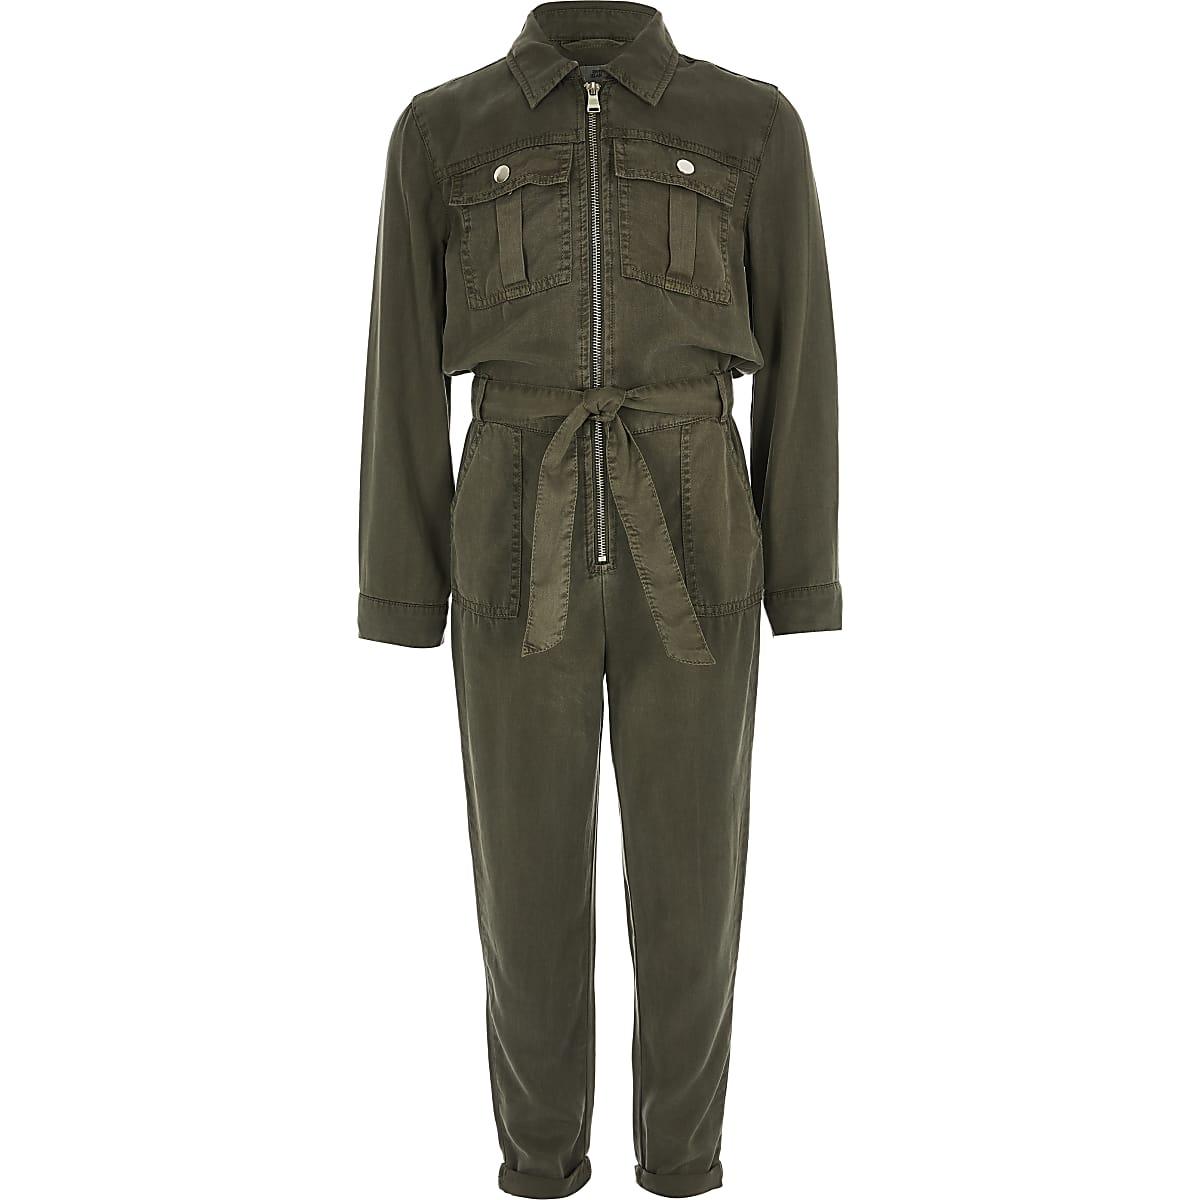 Girls khaki utility jumpsuit